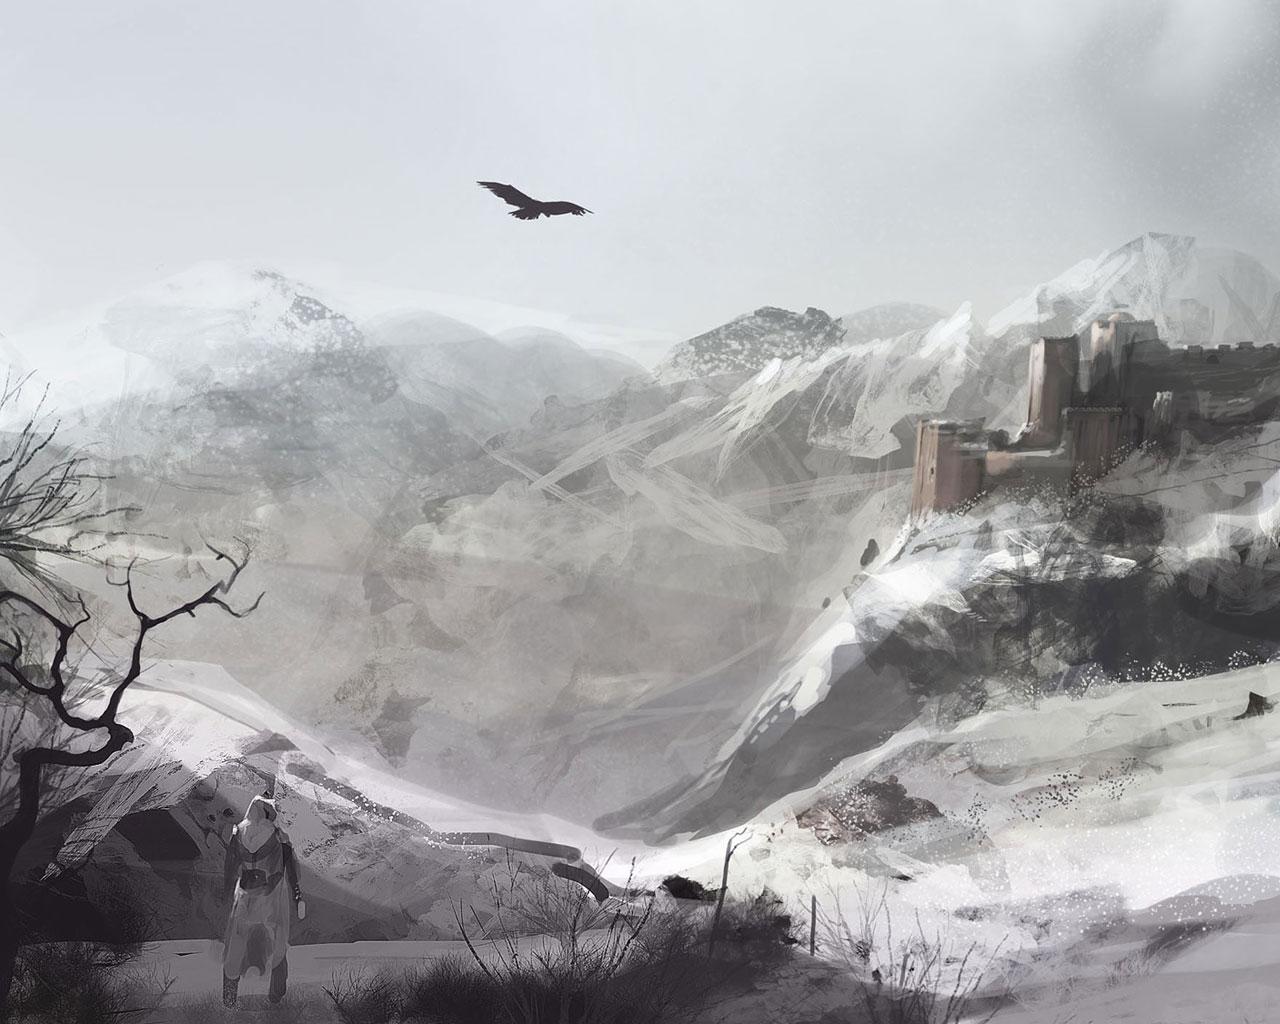 Ac1 Concept Art Wallpaper 7 Image Assassin S Creed Mod Db